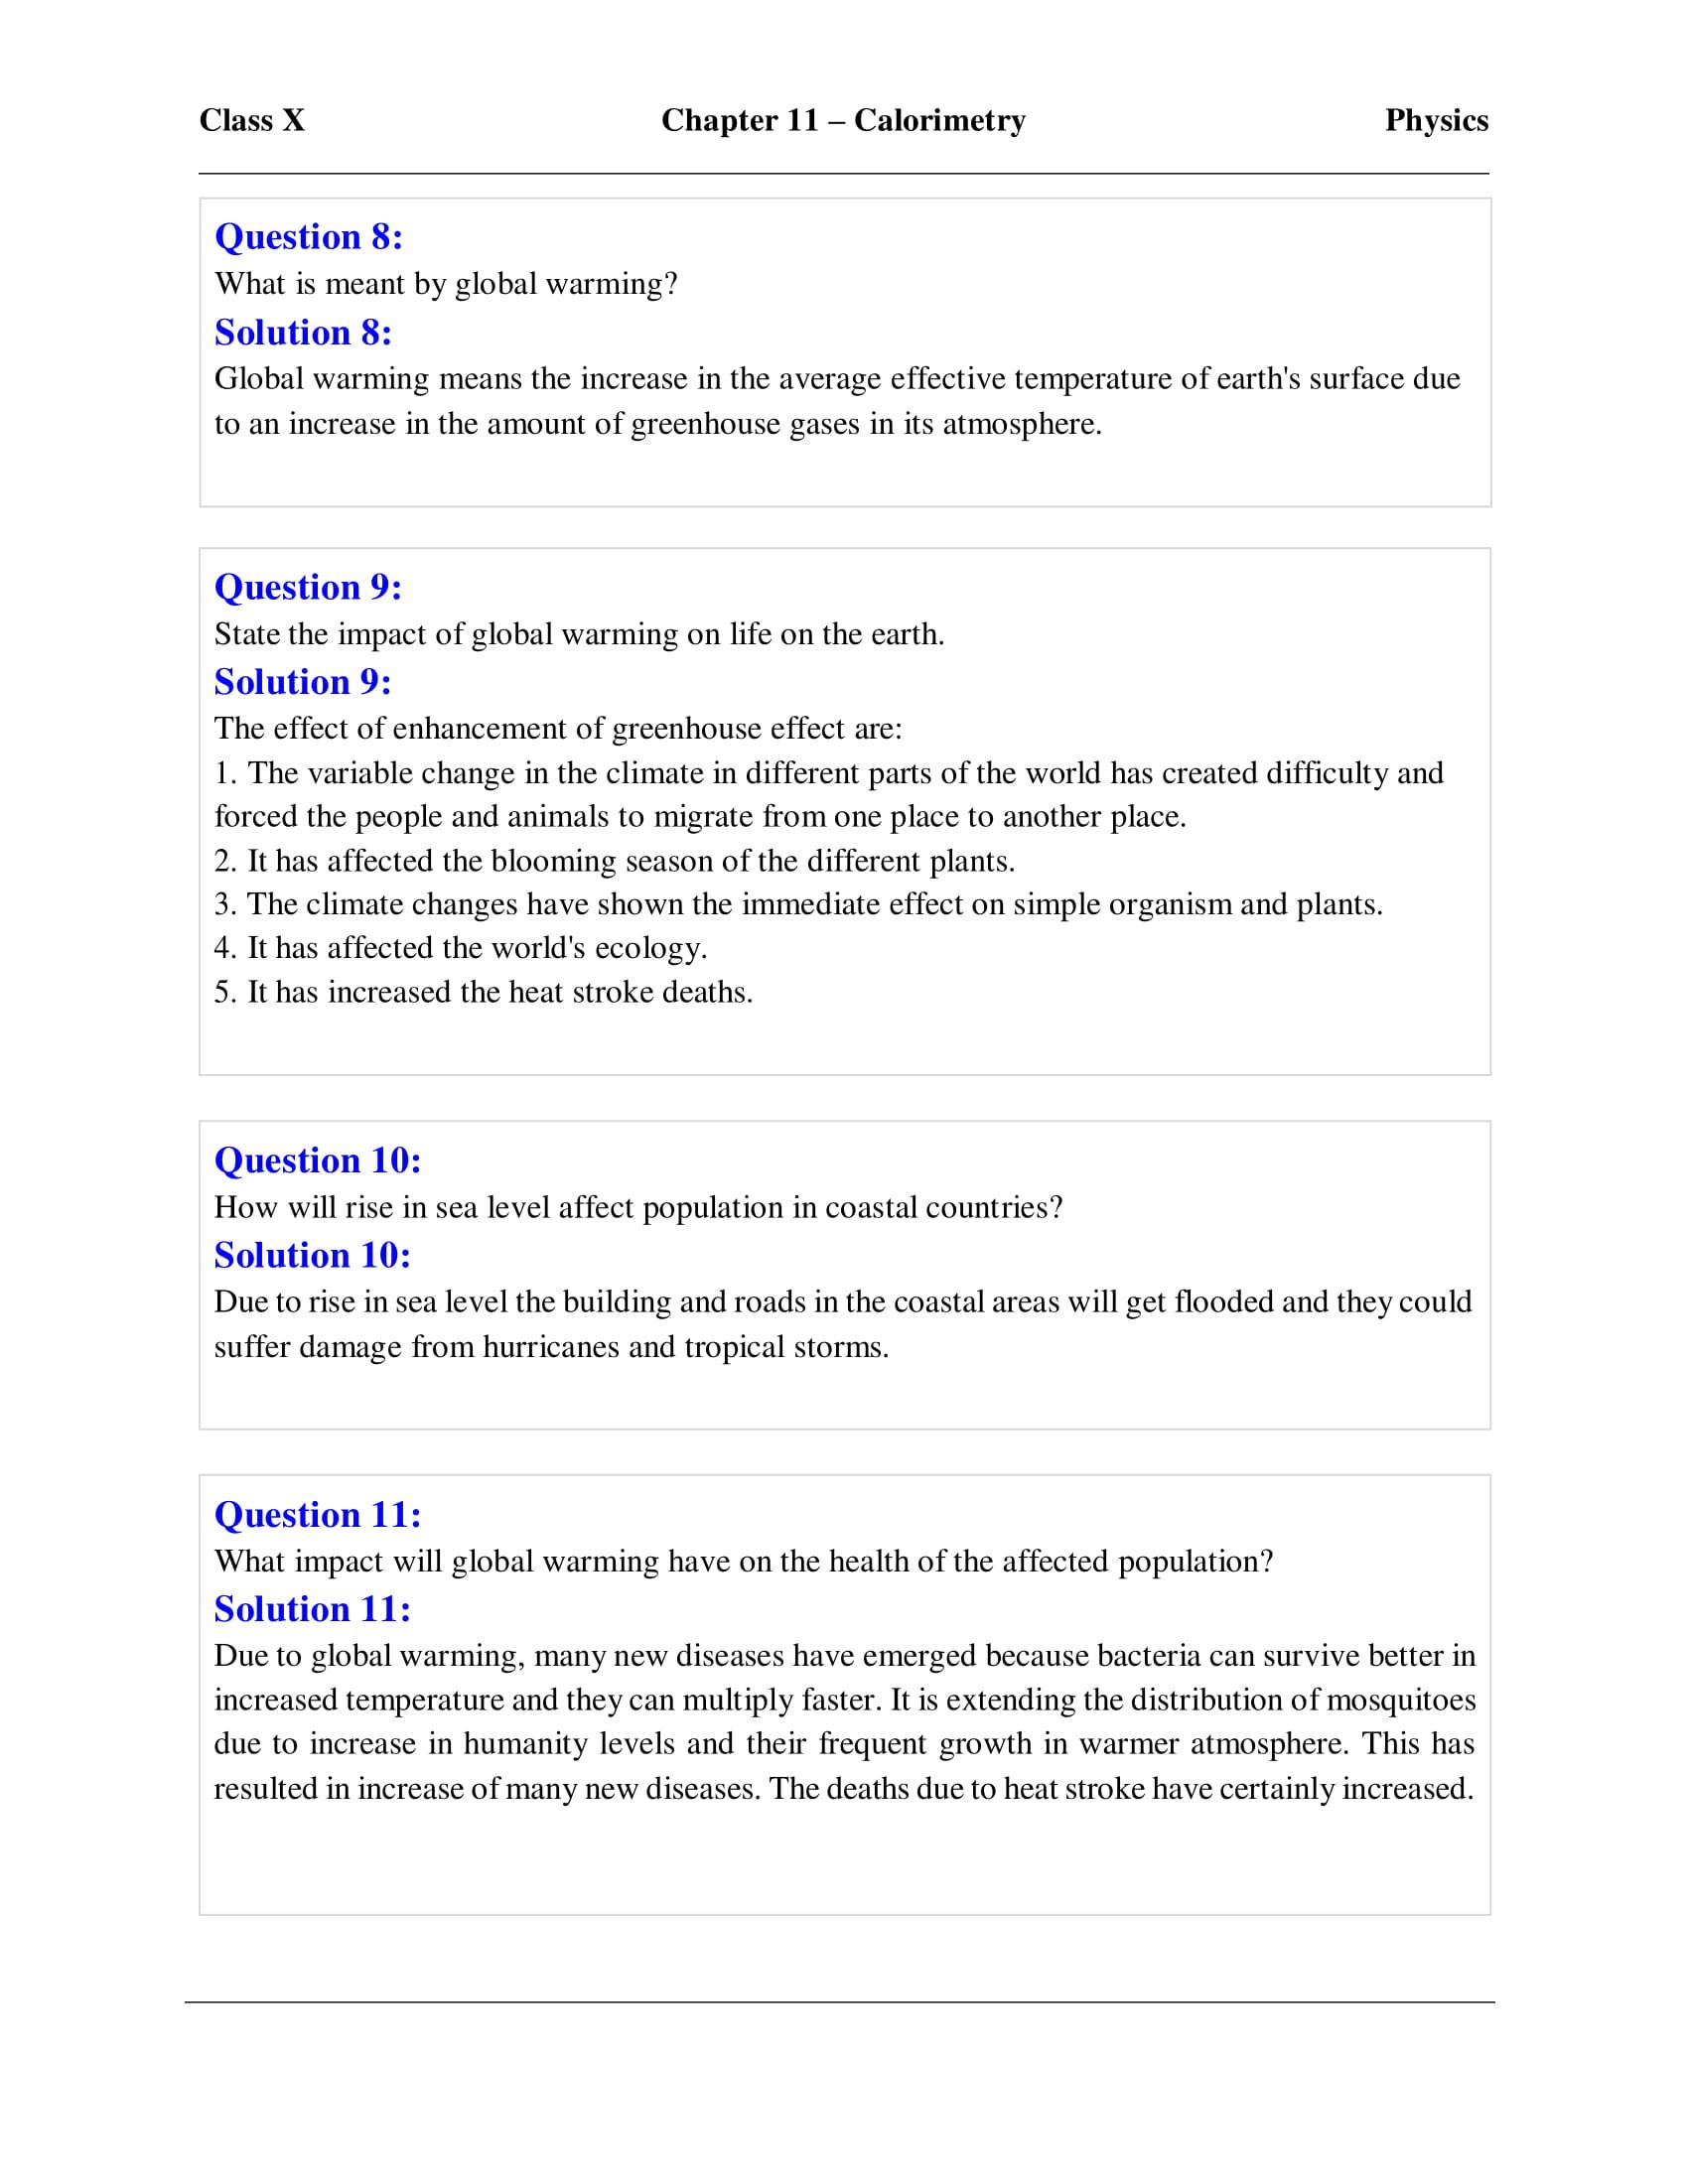 icse-selina-physics-solutions-class-10-chapter-11-calorimetry-33